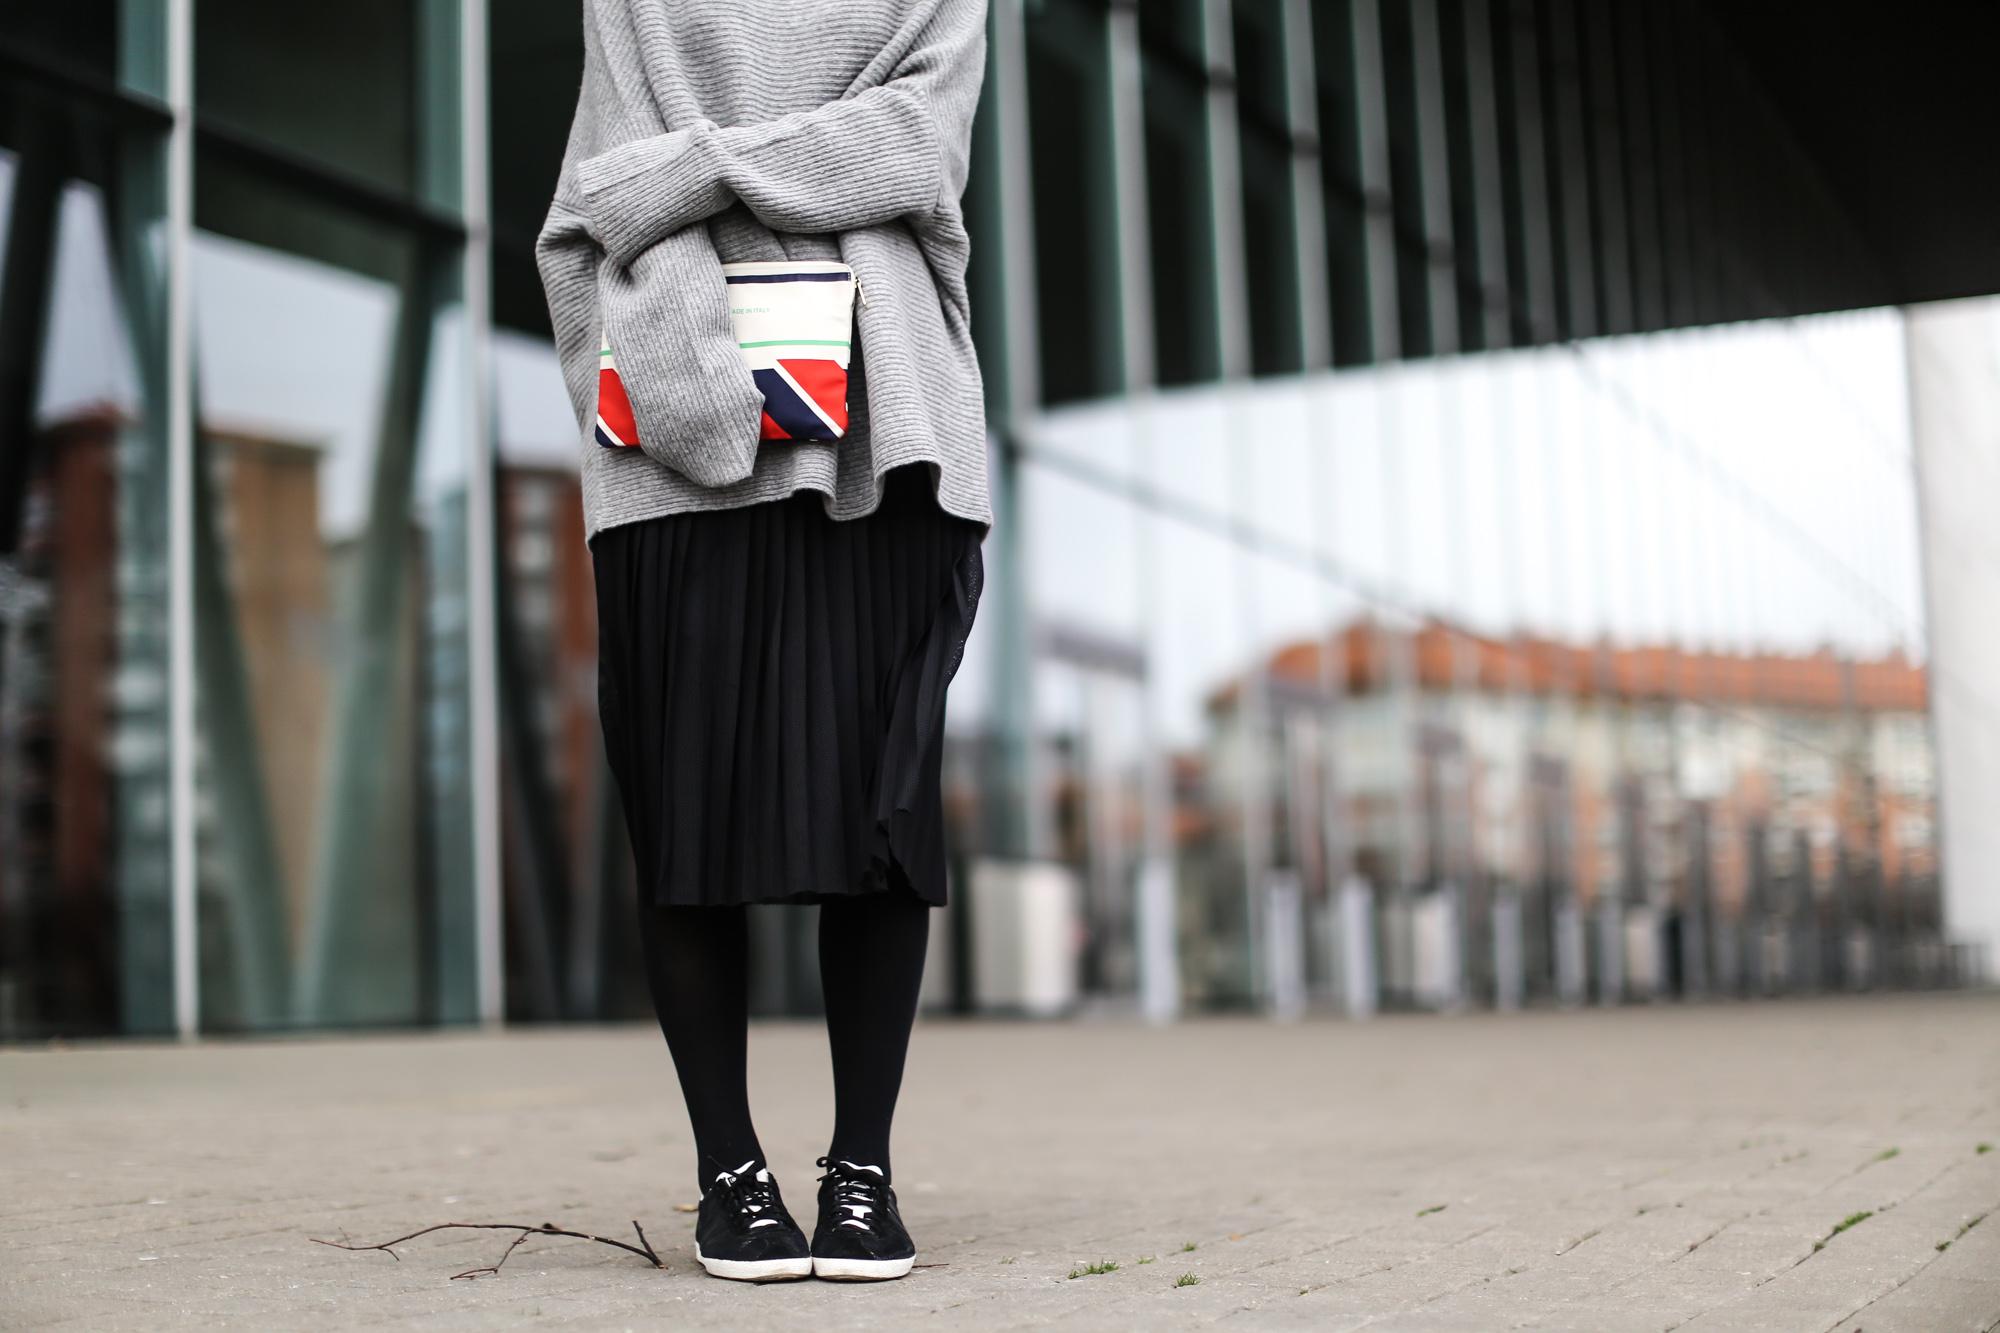 Clochet-streetstyle-zara-oversized-grey-knit-adidas-gazelle-suiteblanco-falda-plisada-celine-paris-clutch-5